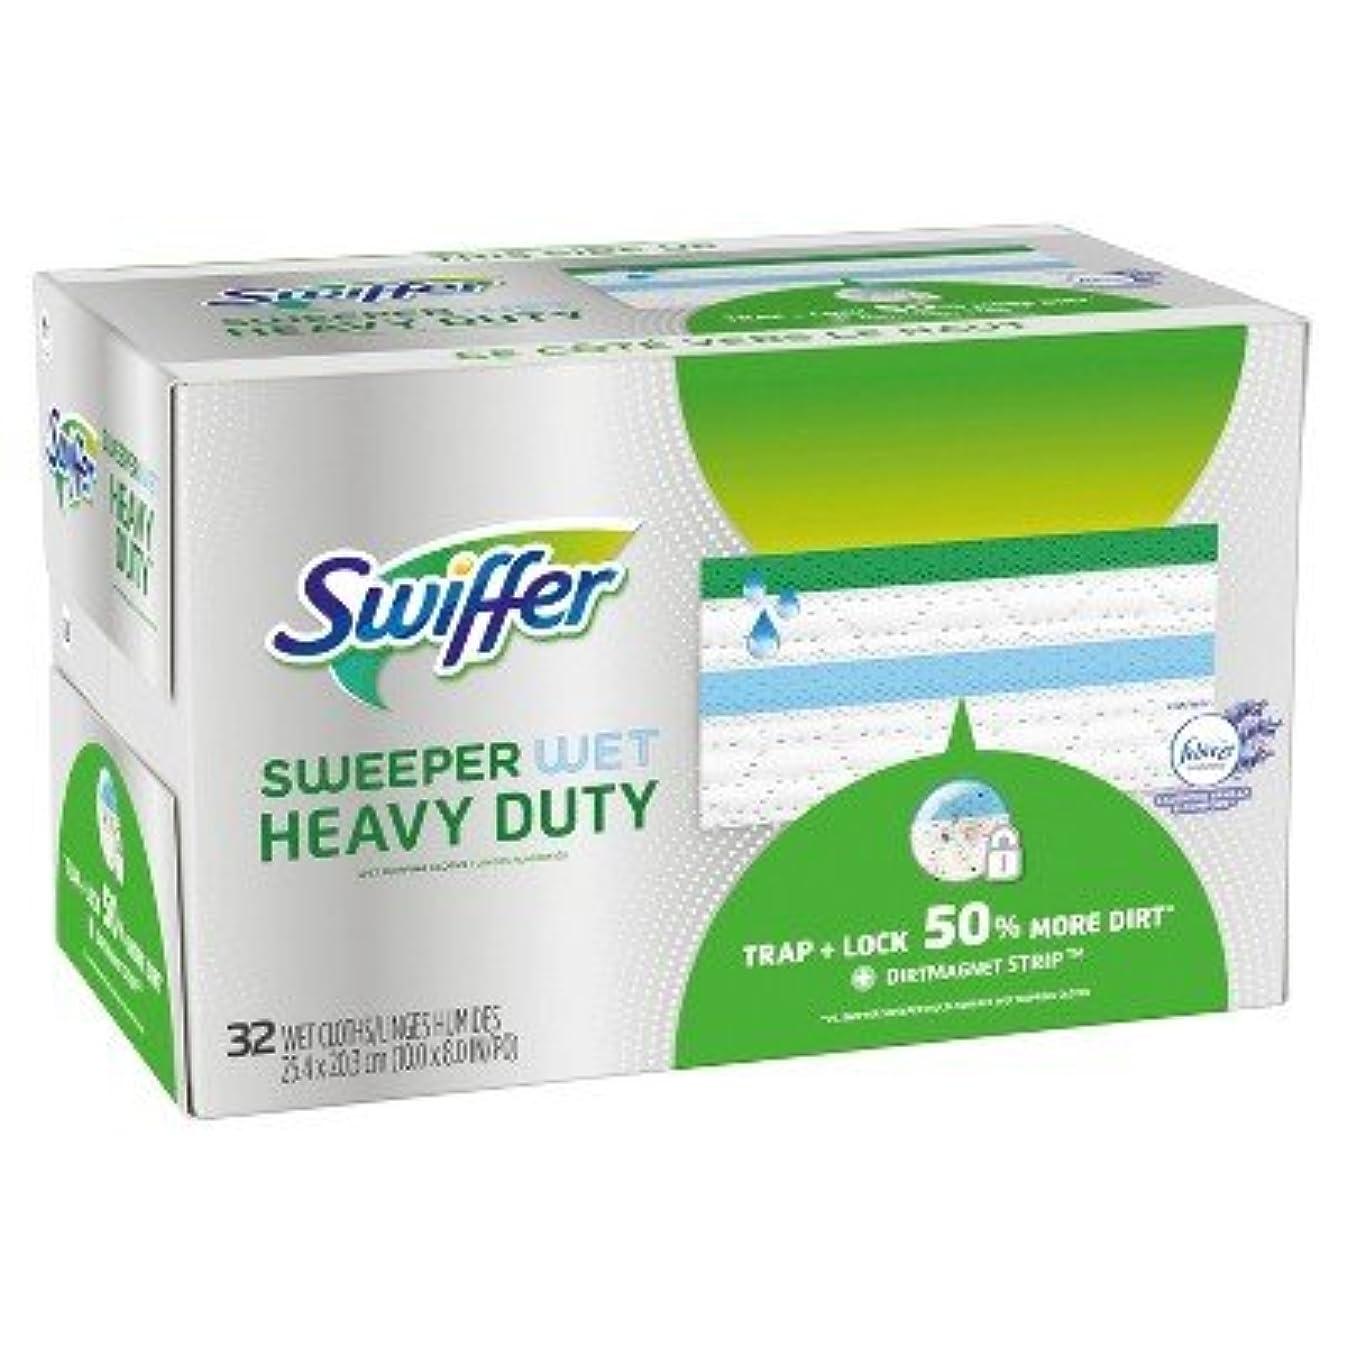 Swiffer Sweeper Heavy Duty Wet Cloths - 32ct Multicolor